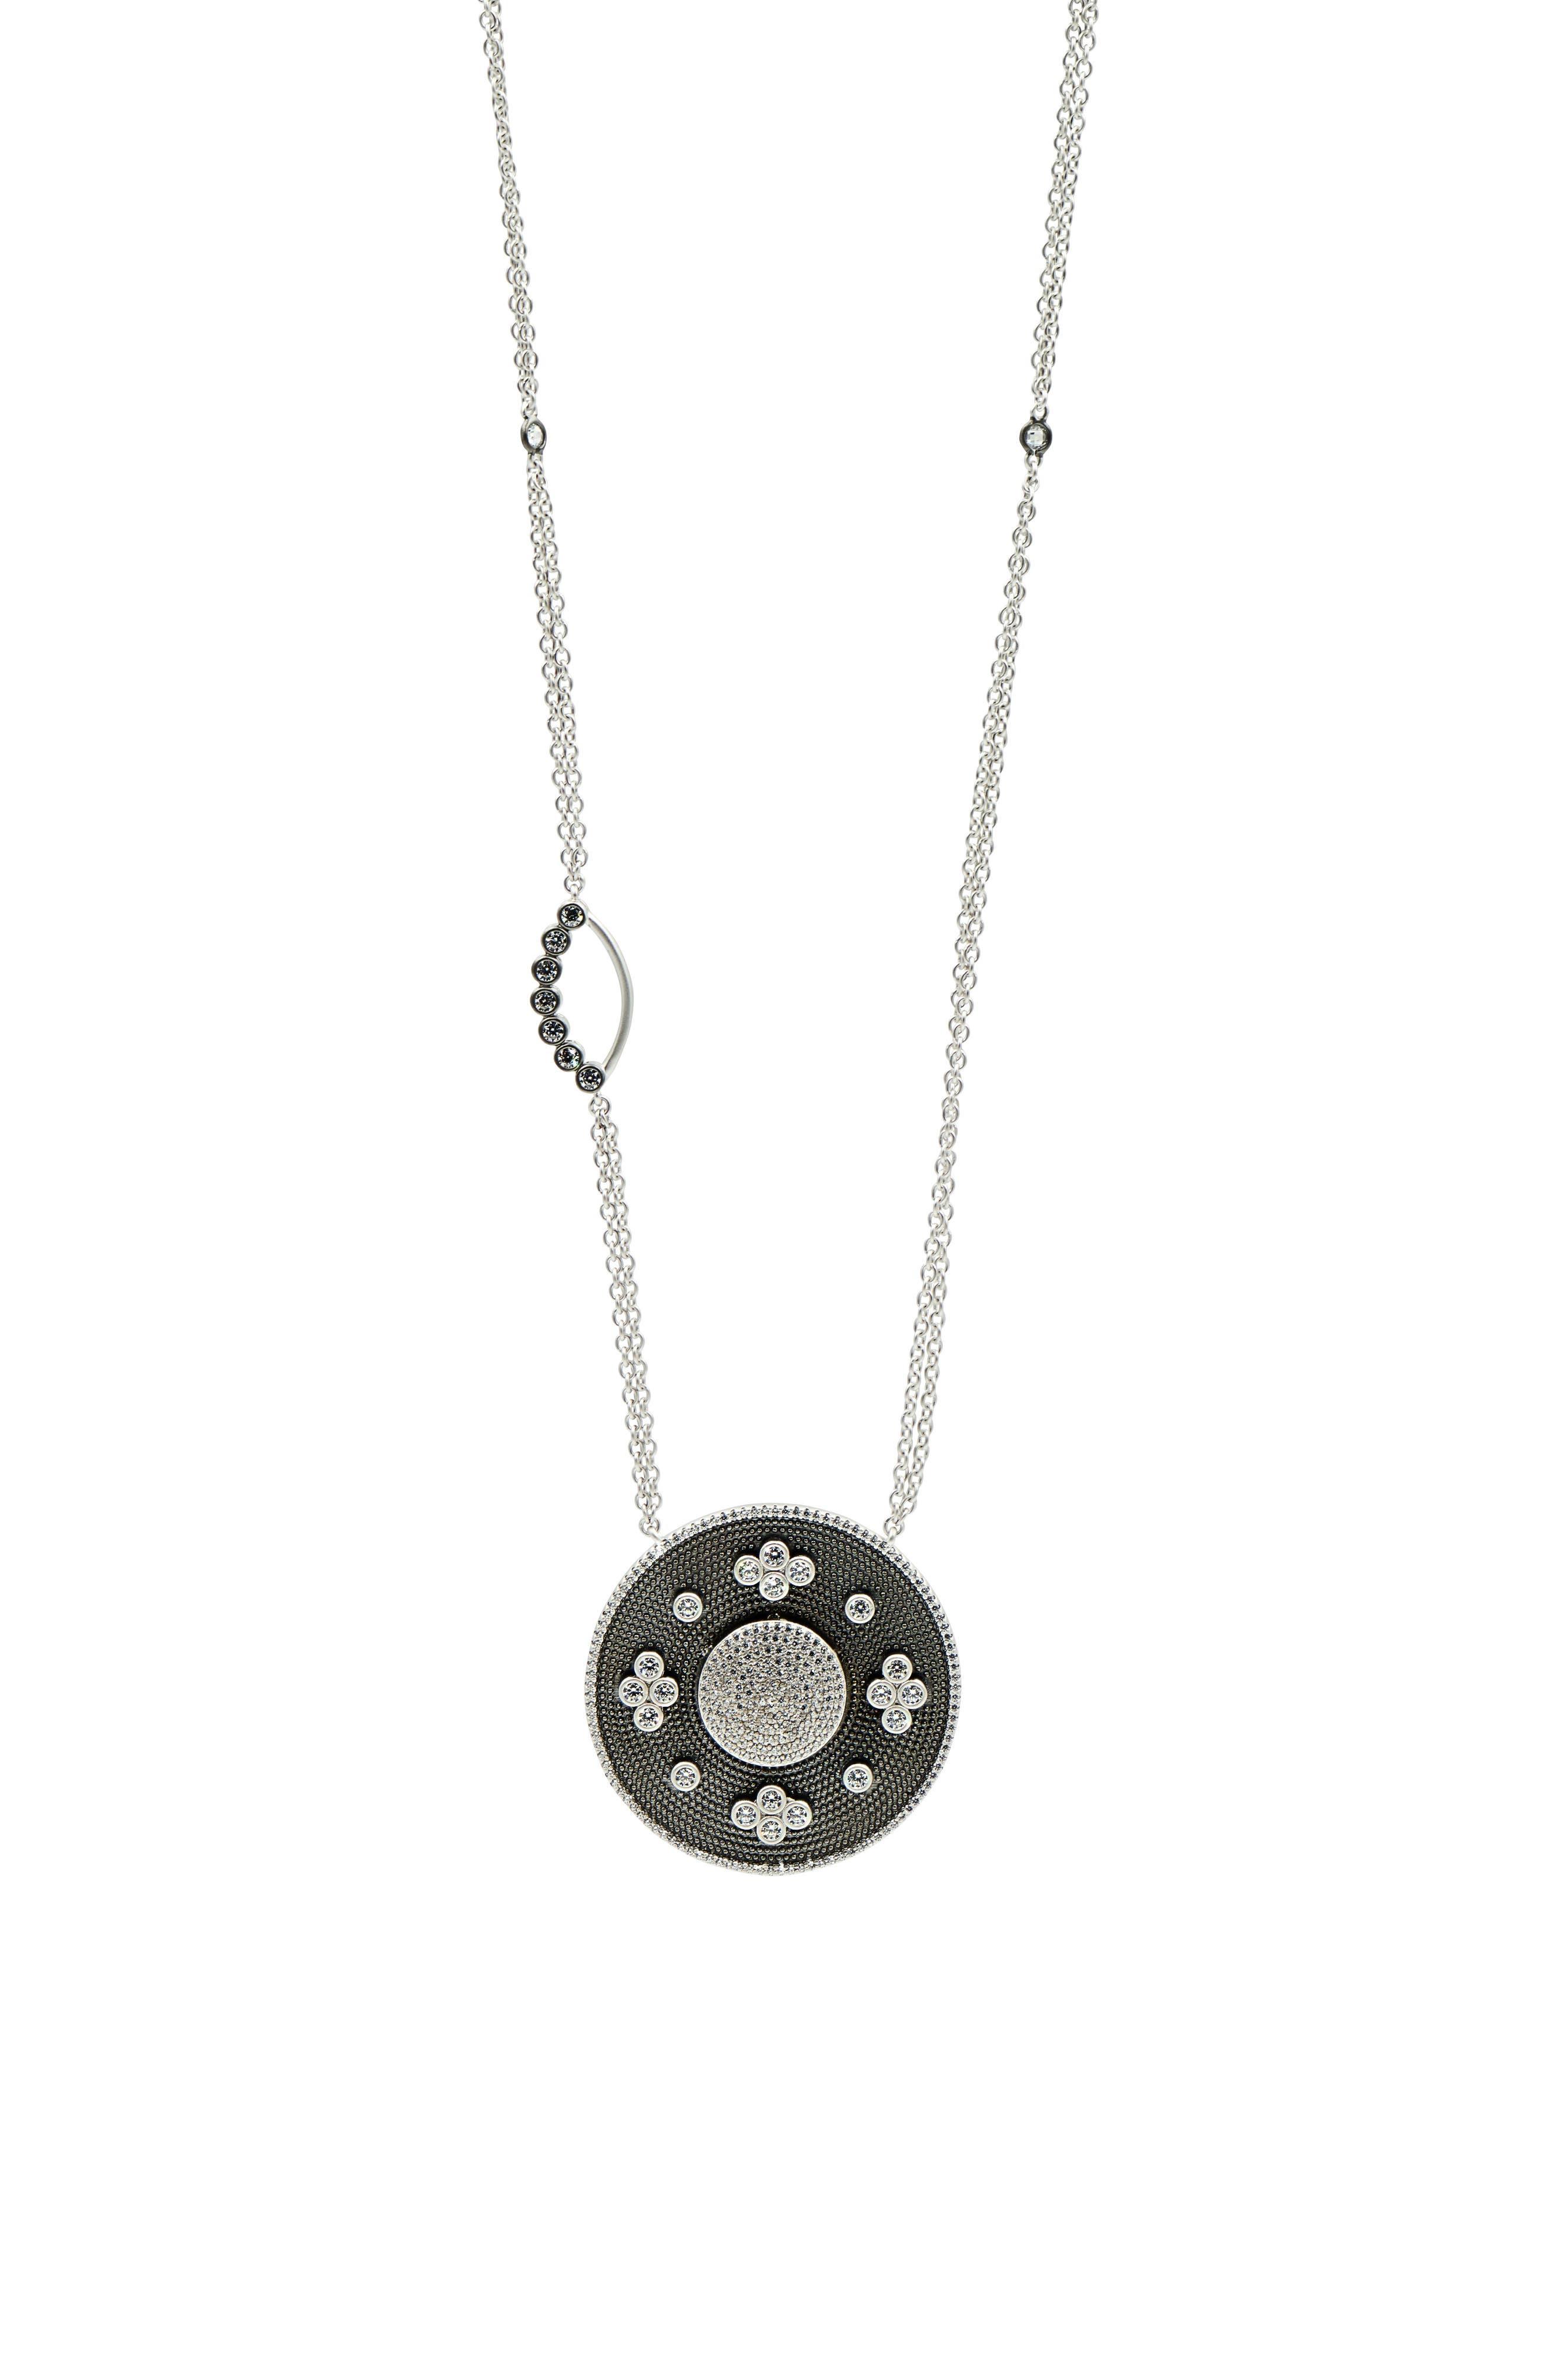 Alternate Image 1 Selected - FREIDA ROTHMAN Industrial Finish Pendant Necklace